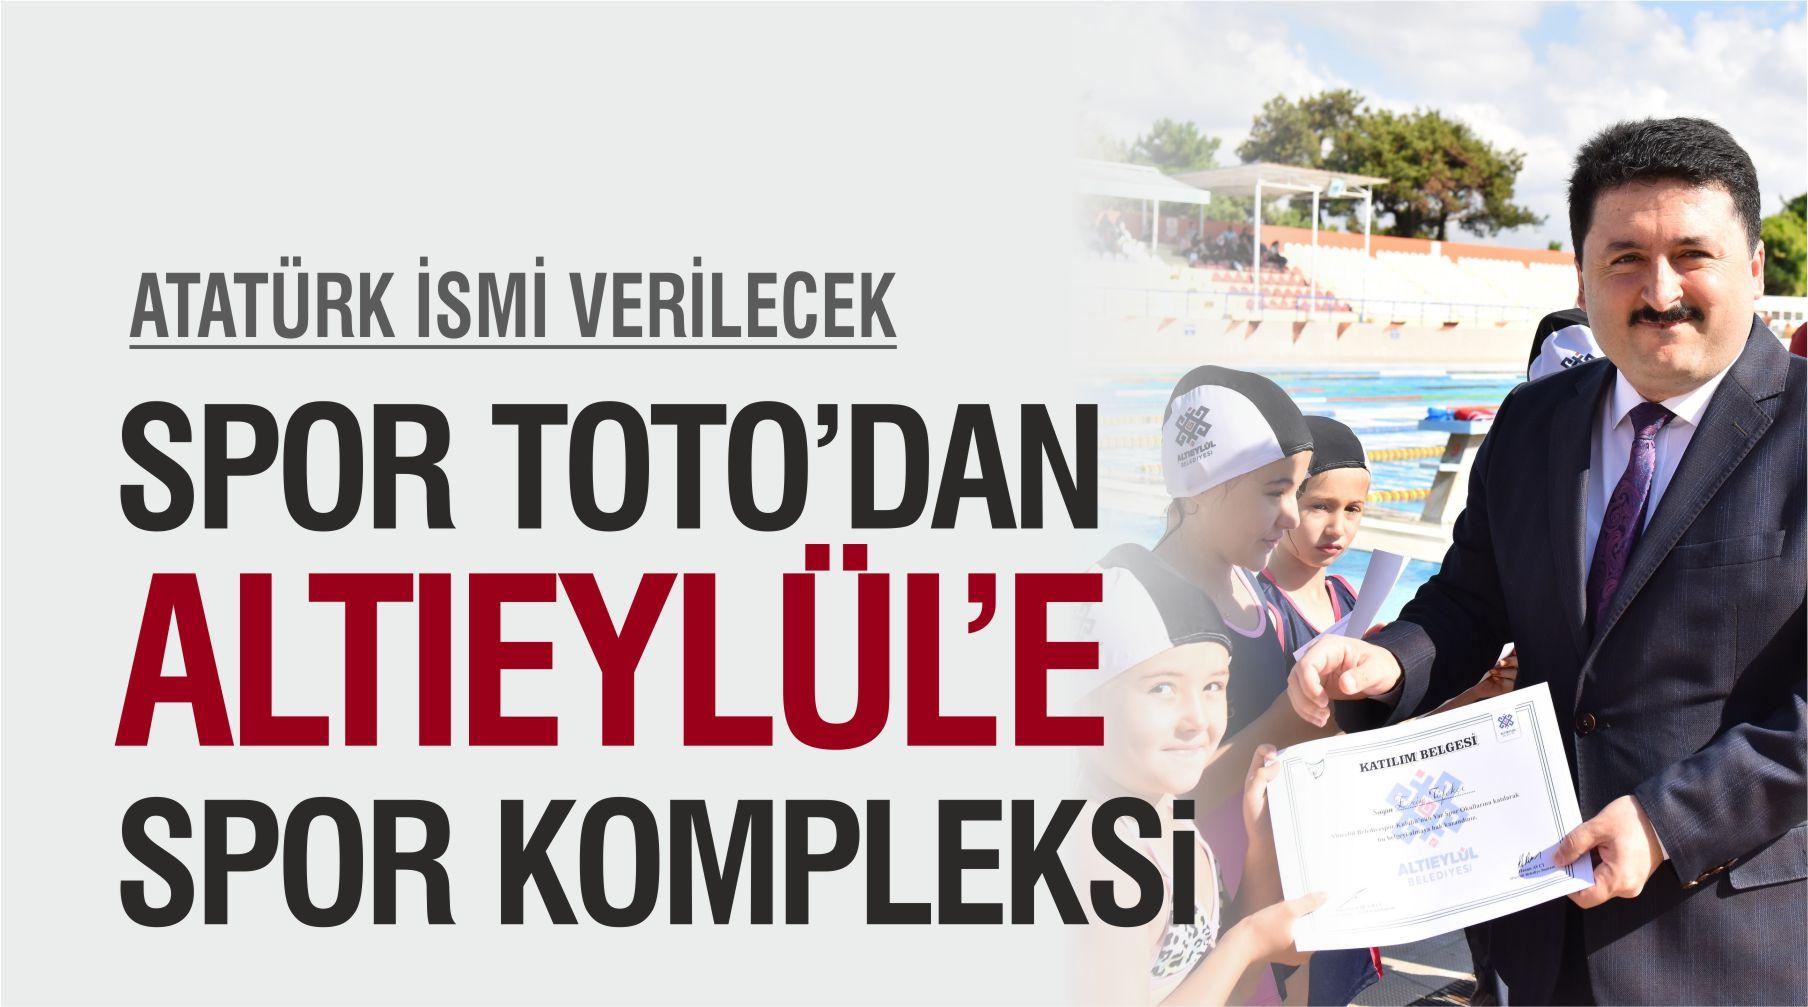 ALTIEYLÜL'E YENİ SPOR KOMPLEKSİ